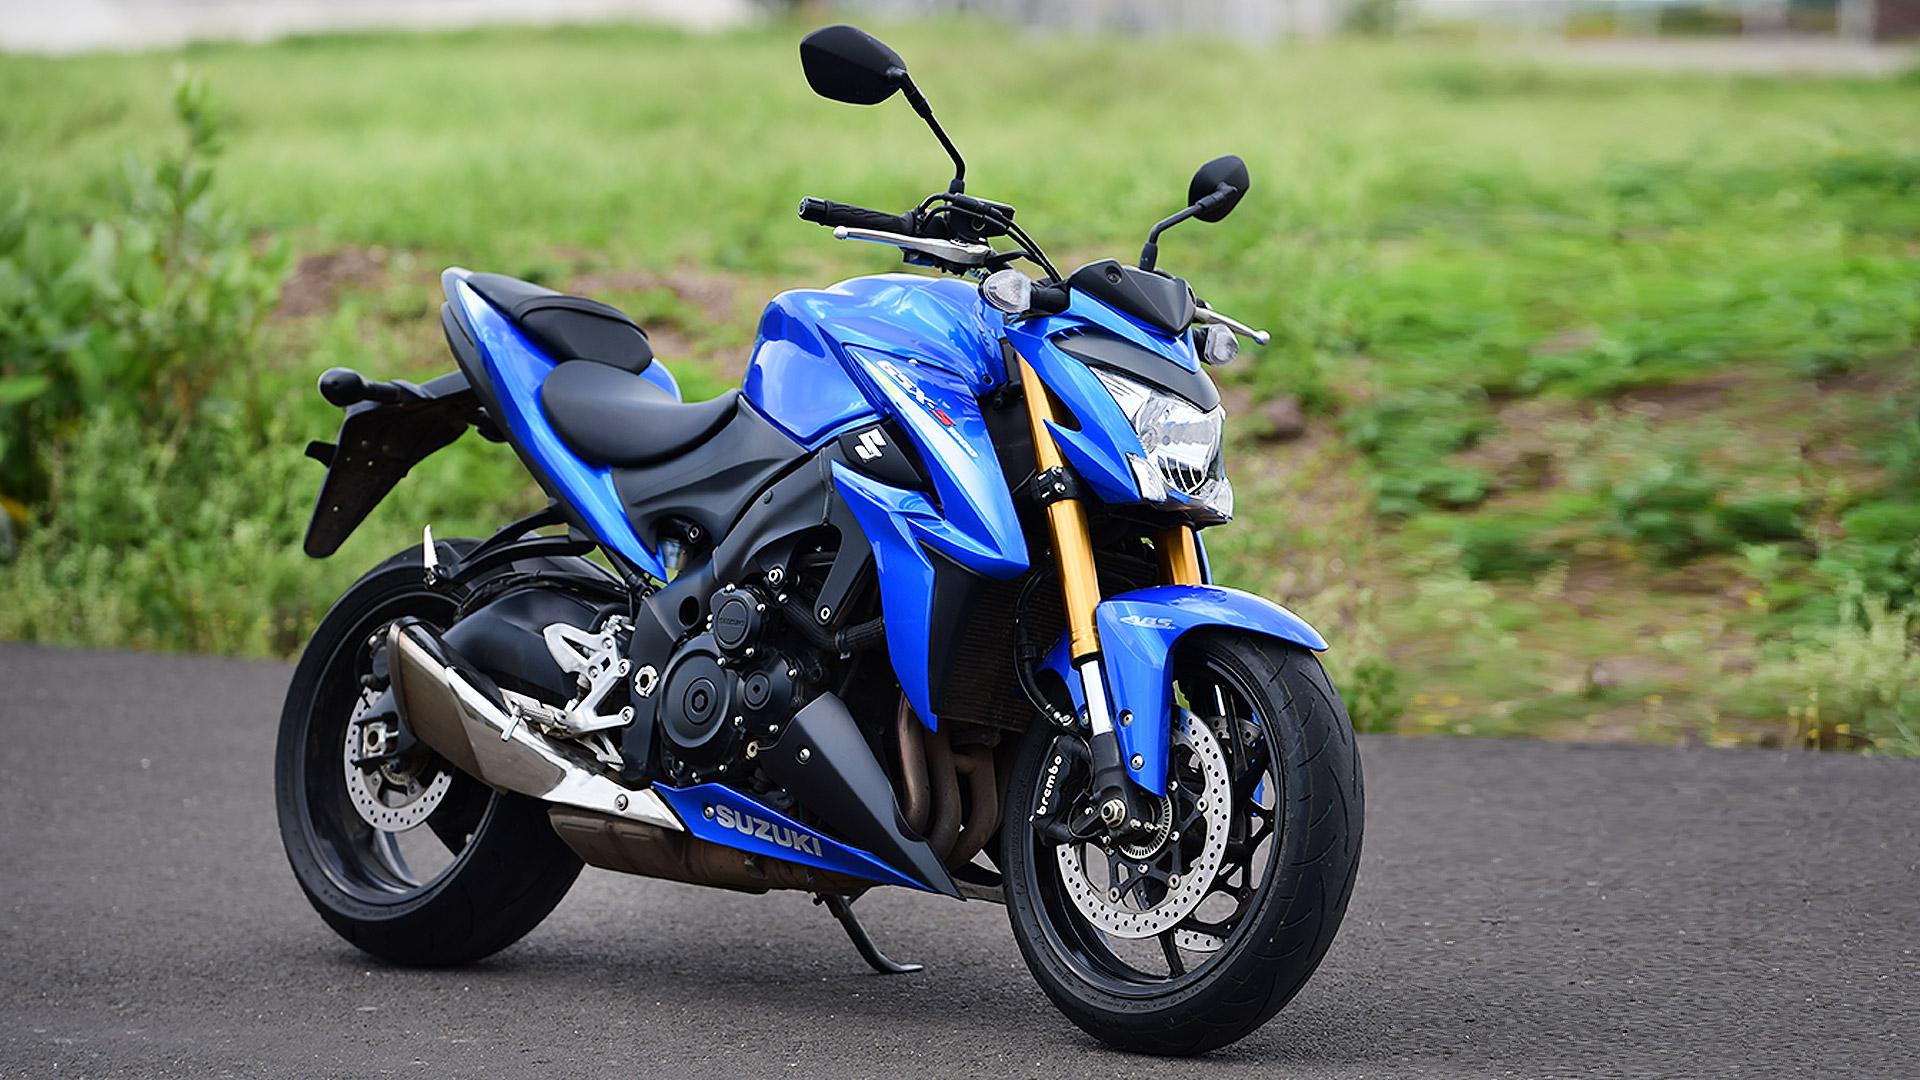 Suzuki GSX- S1000 2015 STD Compare